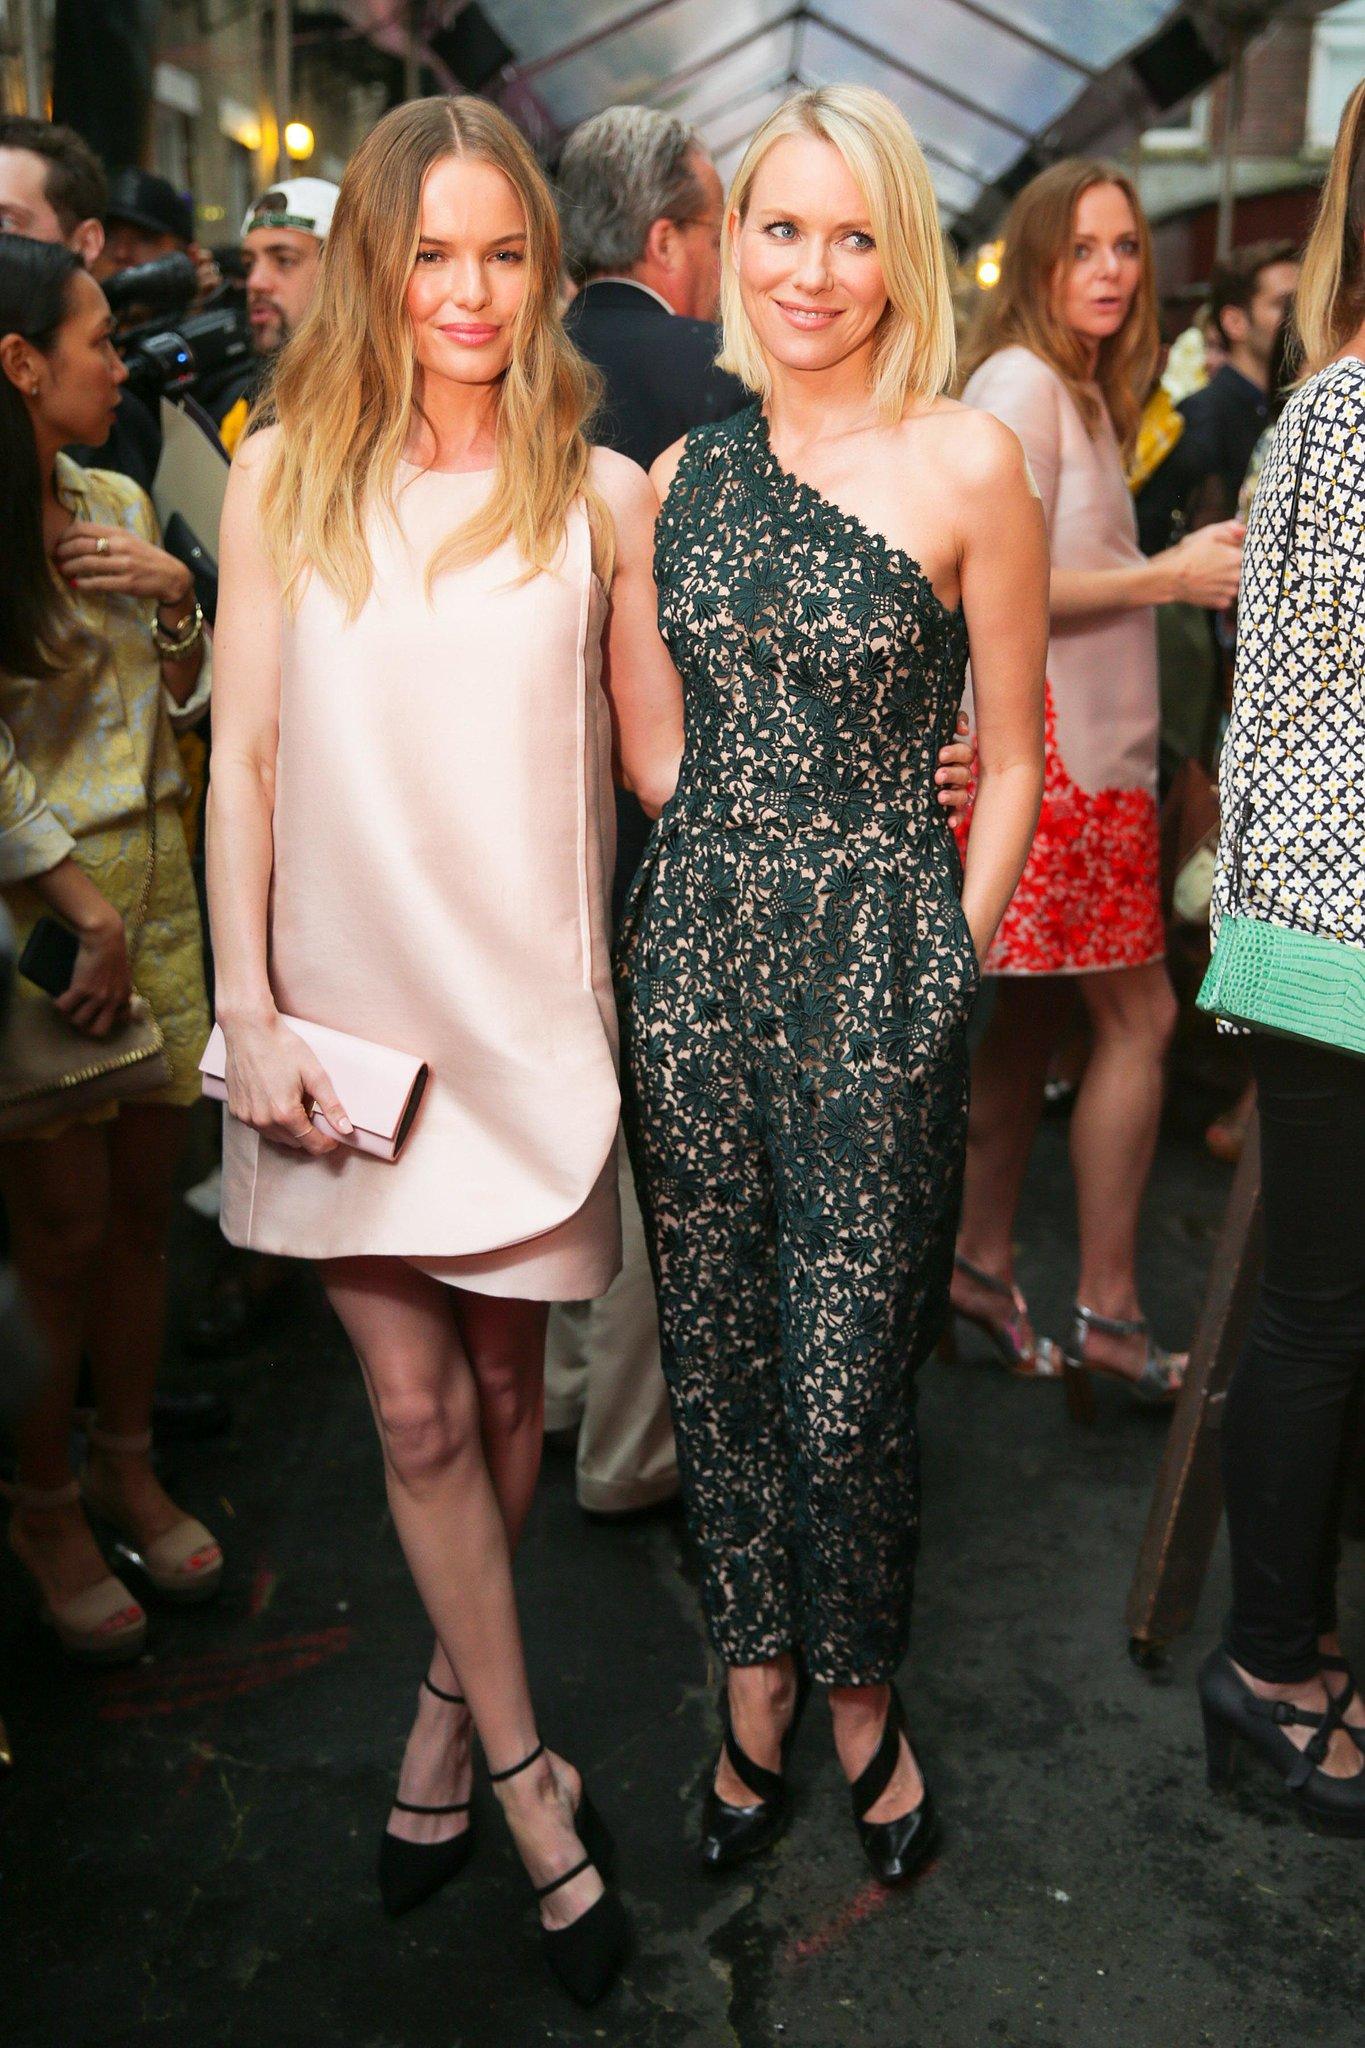 Kate Bosworth and Naomi Watts at Stella McCartney's Resort 2014 presentation. Source: David X Prutting/BFAnyc.com